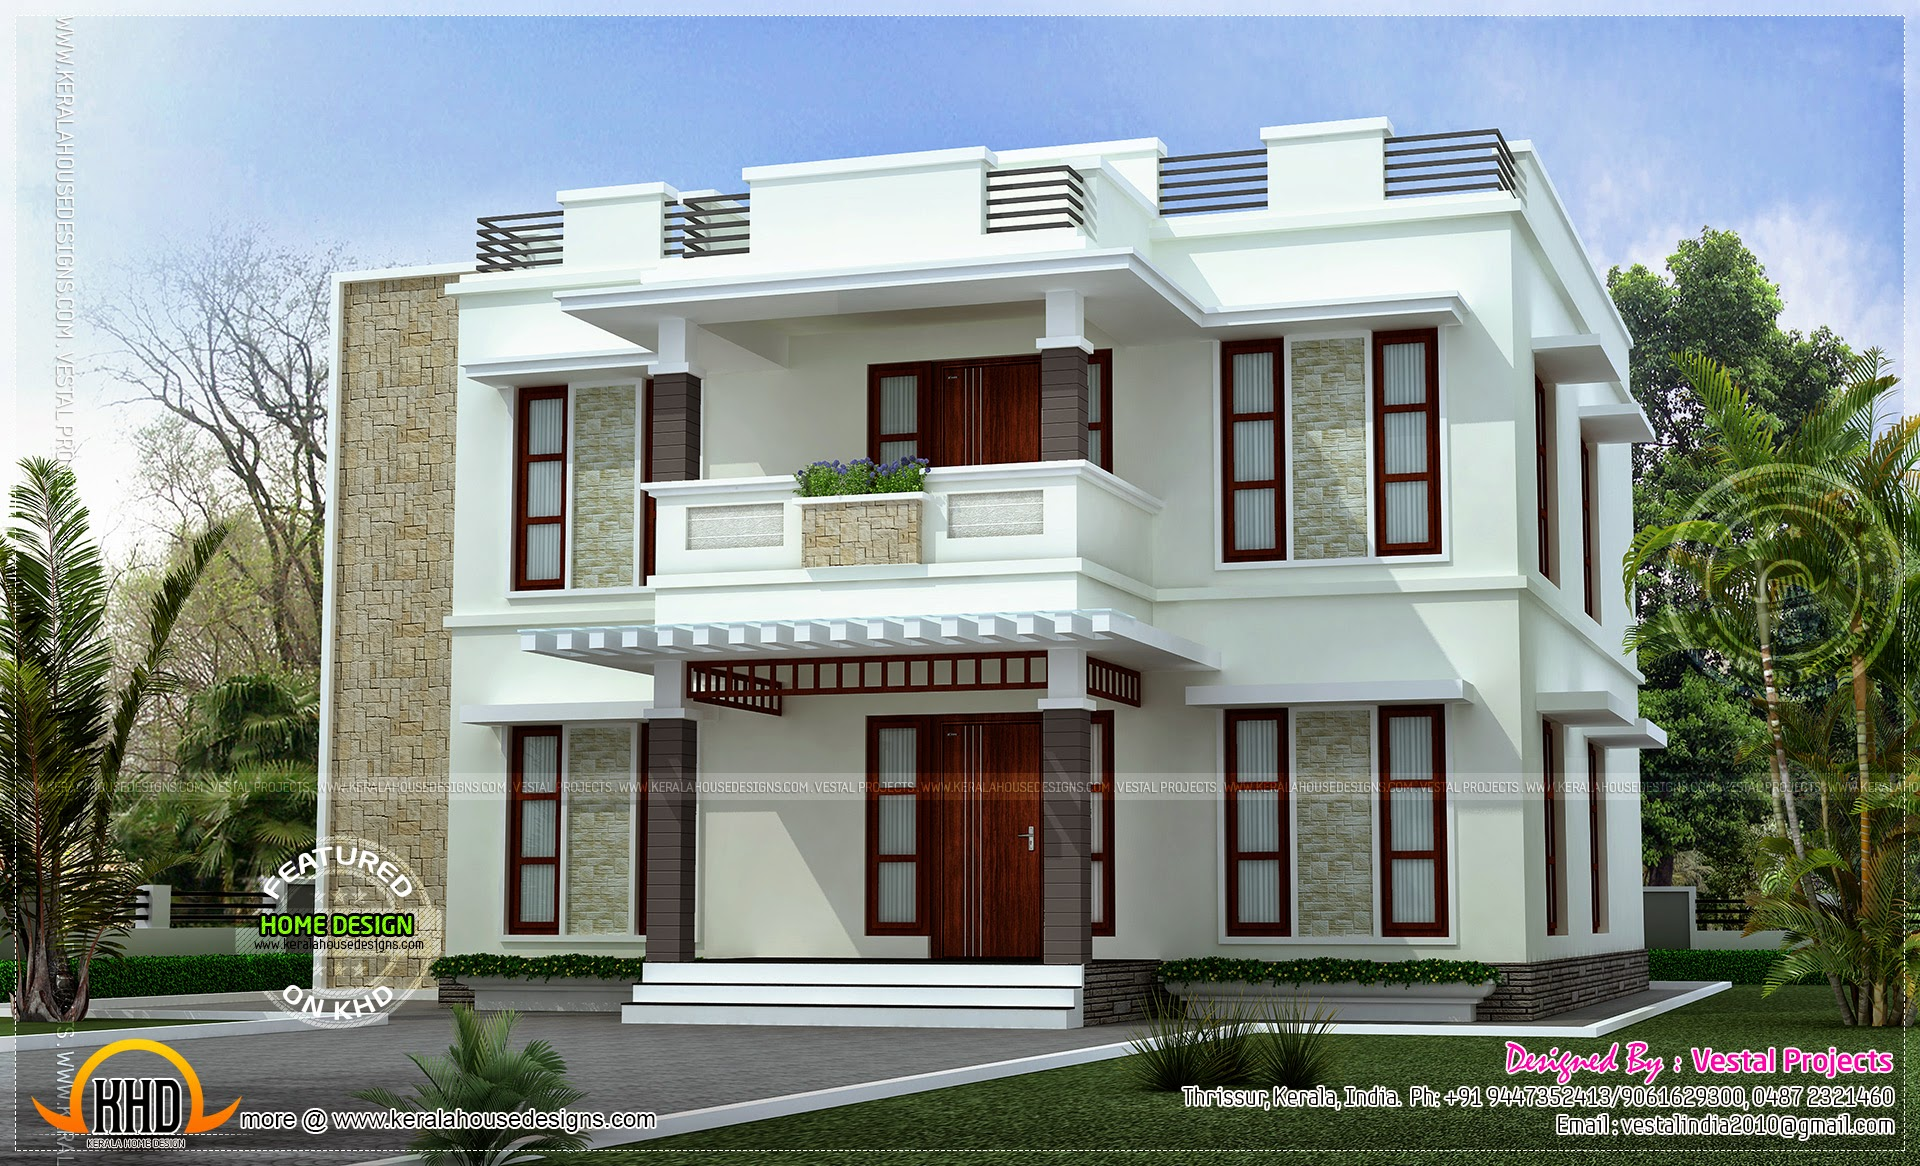 Beautiful home design flat roof style  Kerala home design